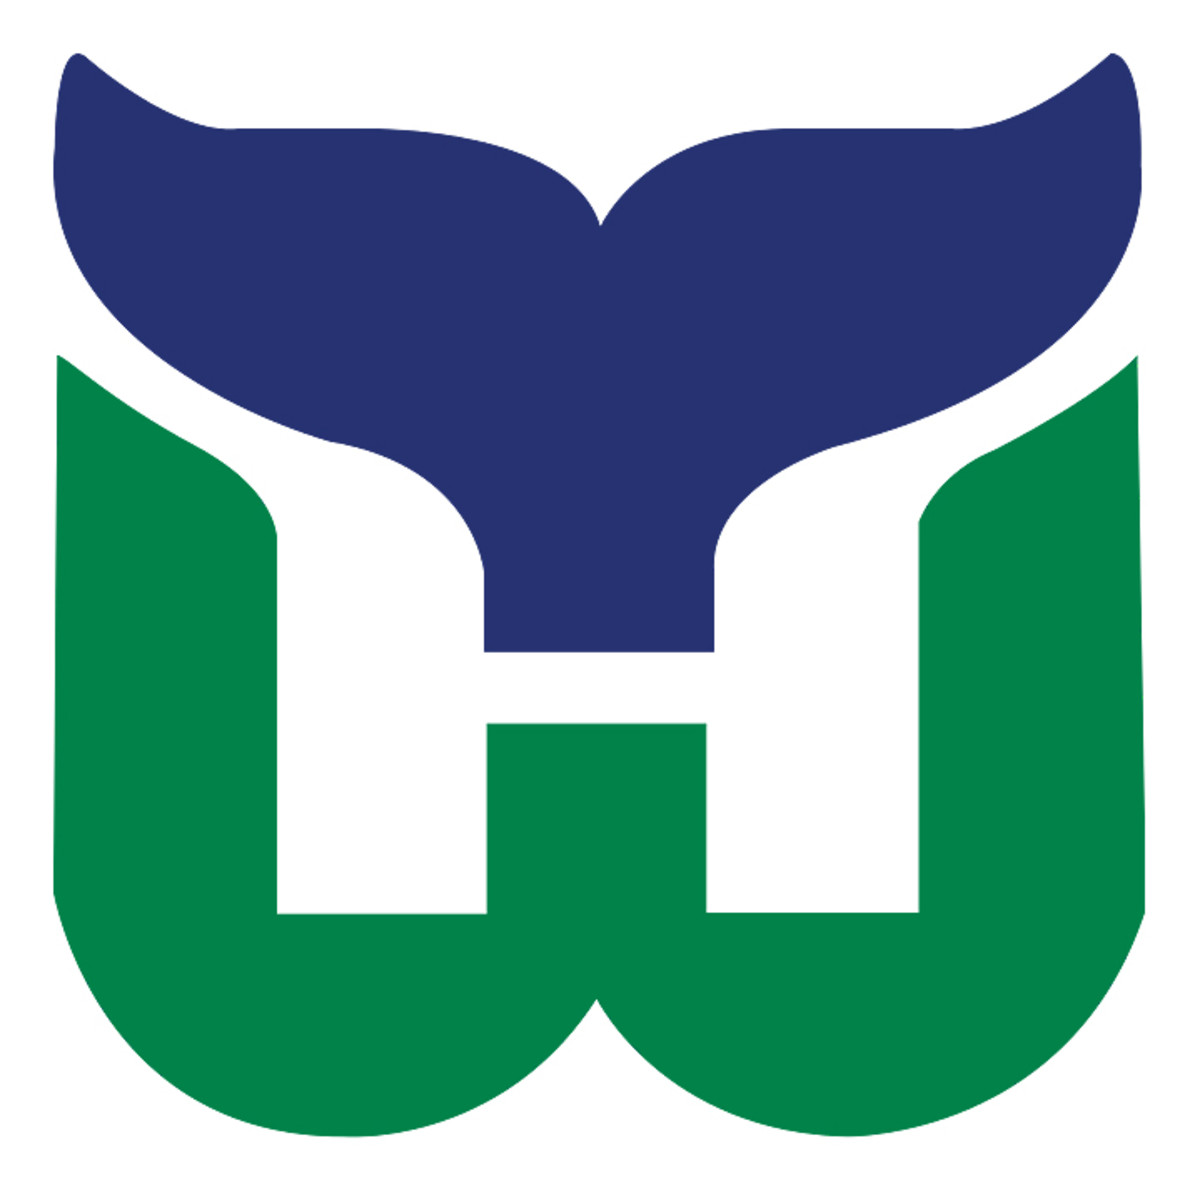 Hartford-Whalers-logo-1979-92.jpg